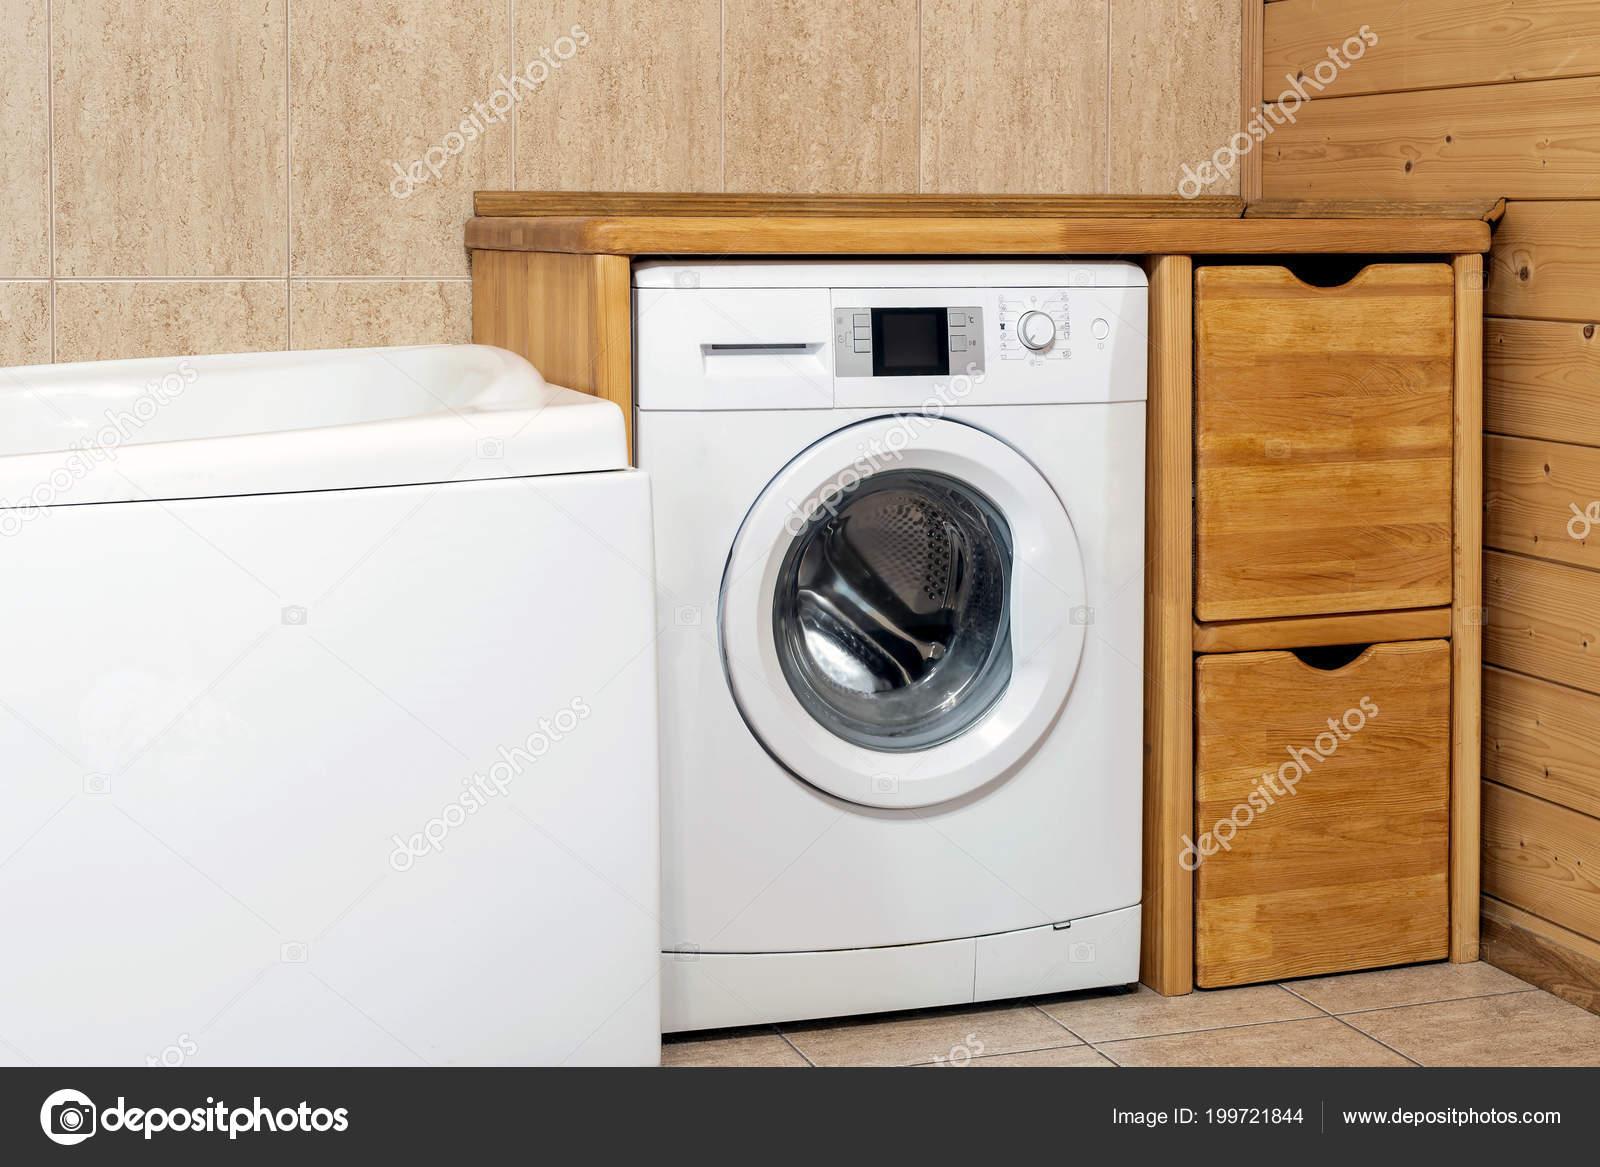 Wasmachine In Badkamer : Rustieke badkamer interieur wasmachine overdekte wiith houten